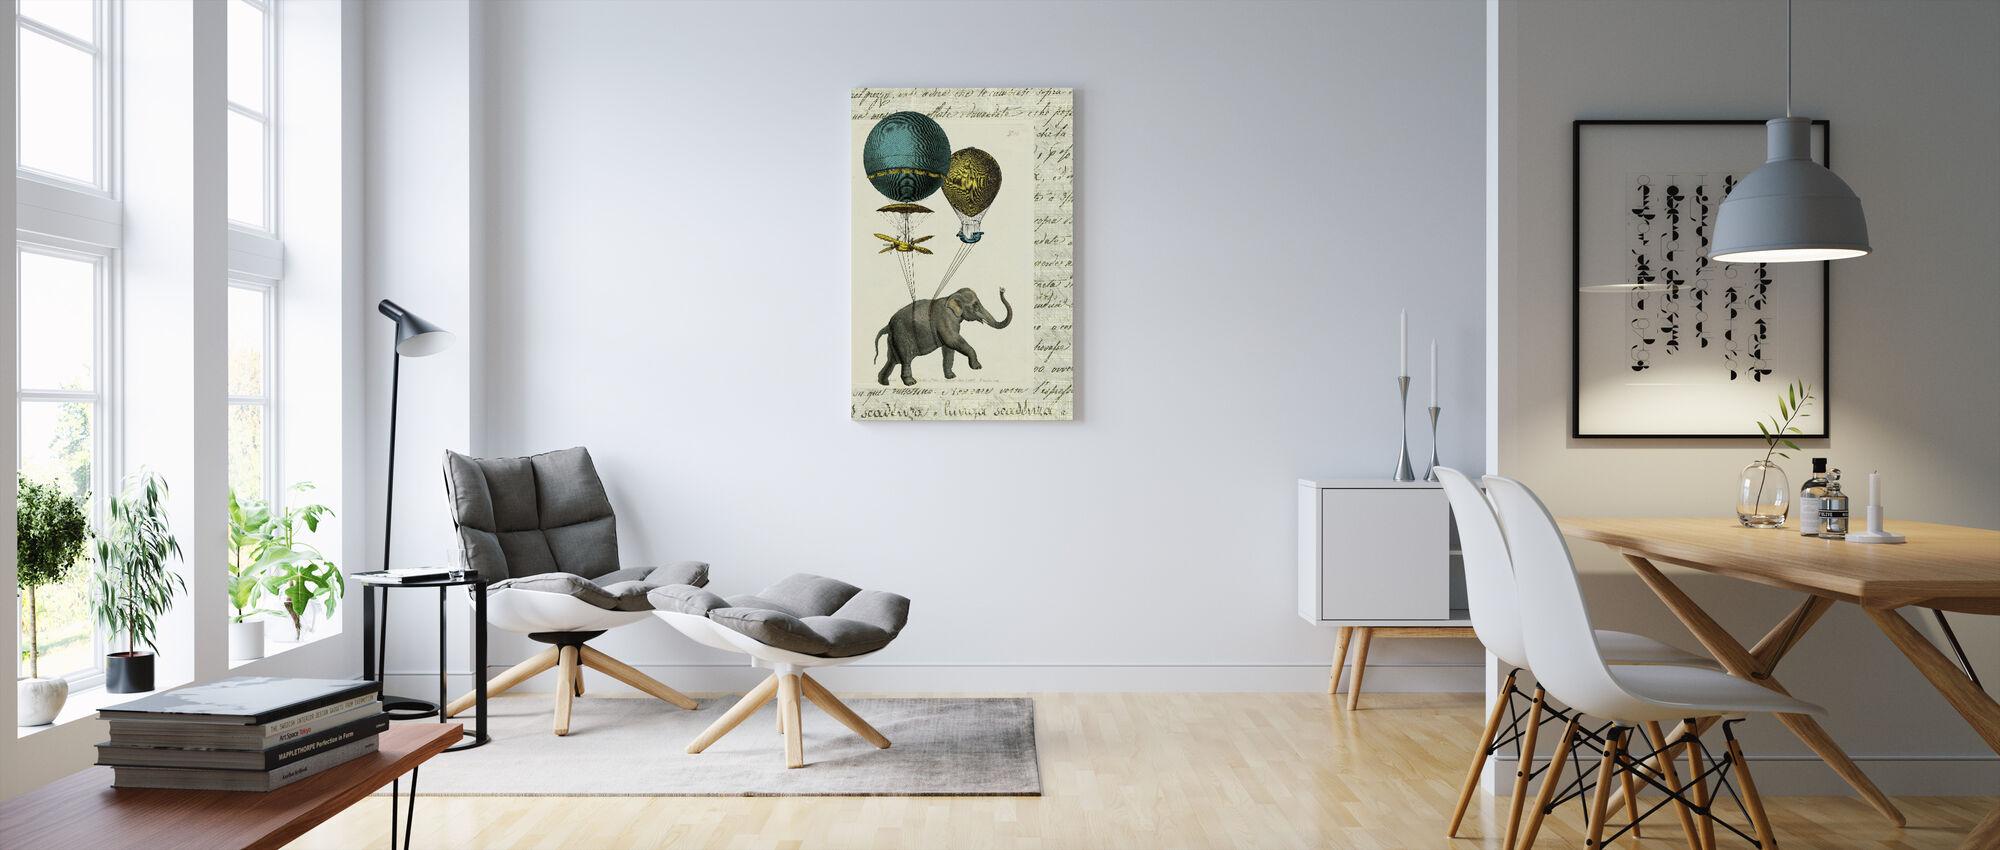 Elephant Ride 2 - Canvas print - Living Room